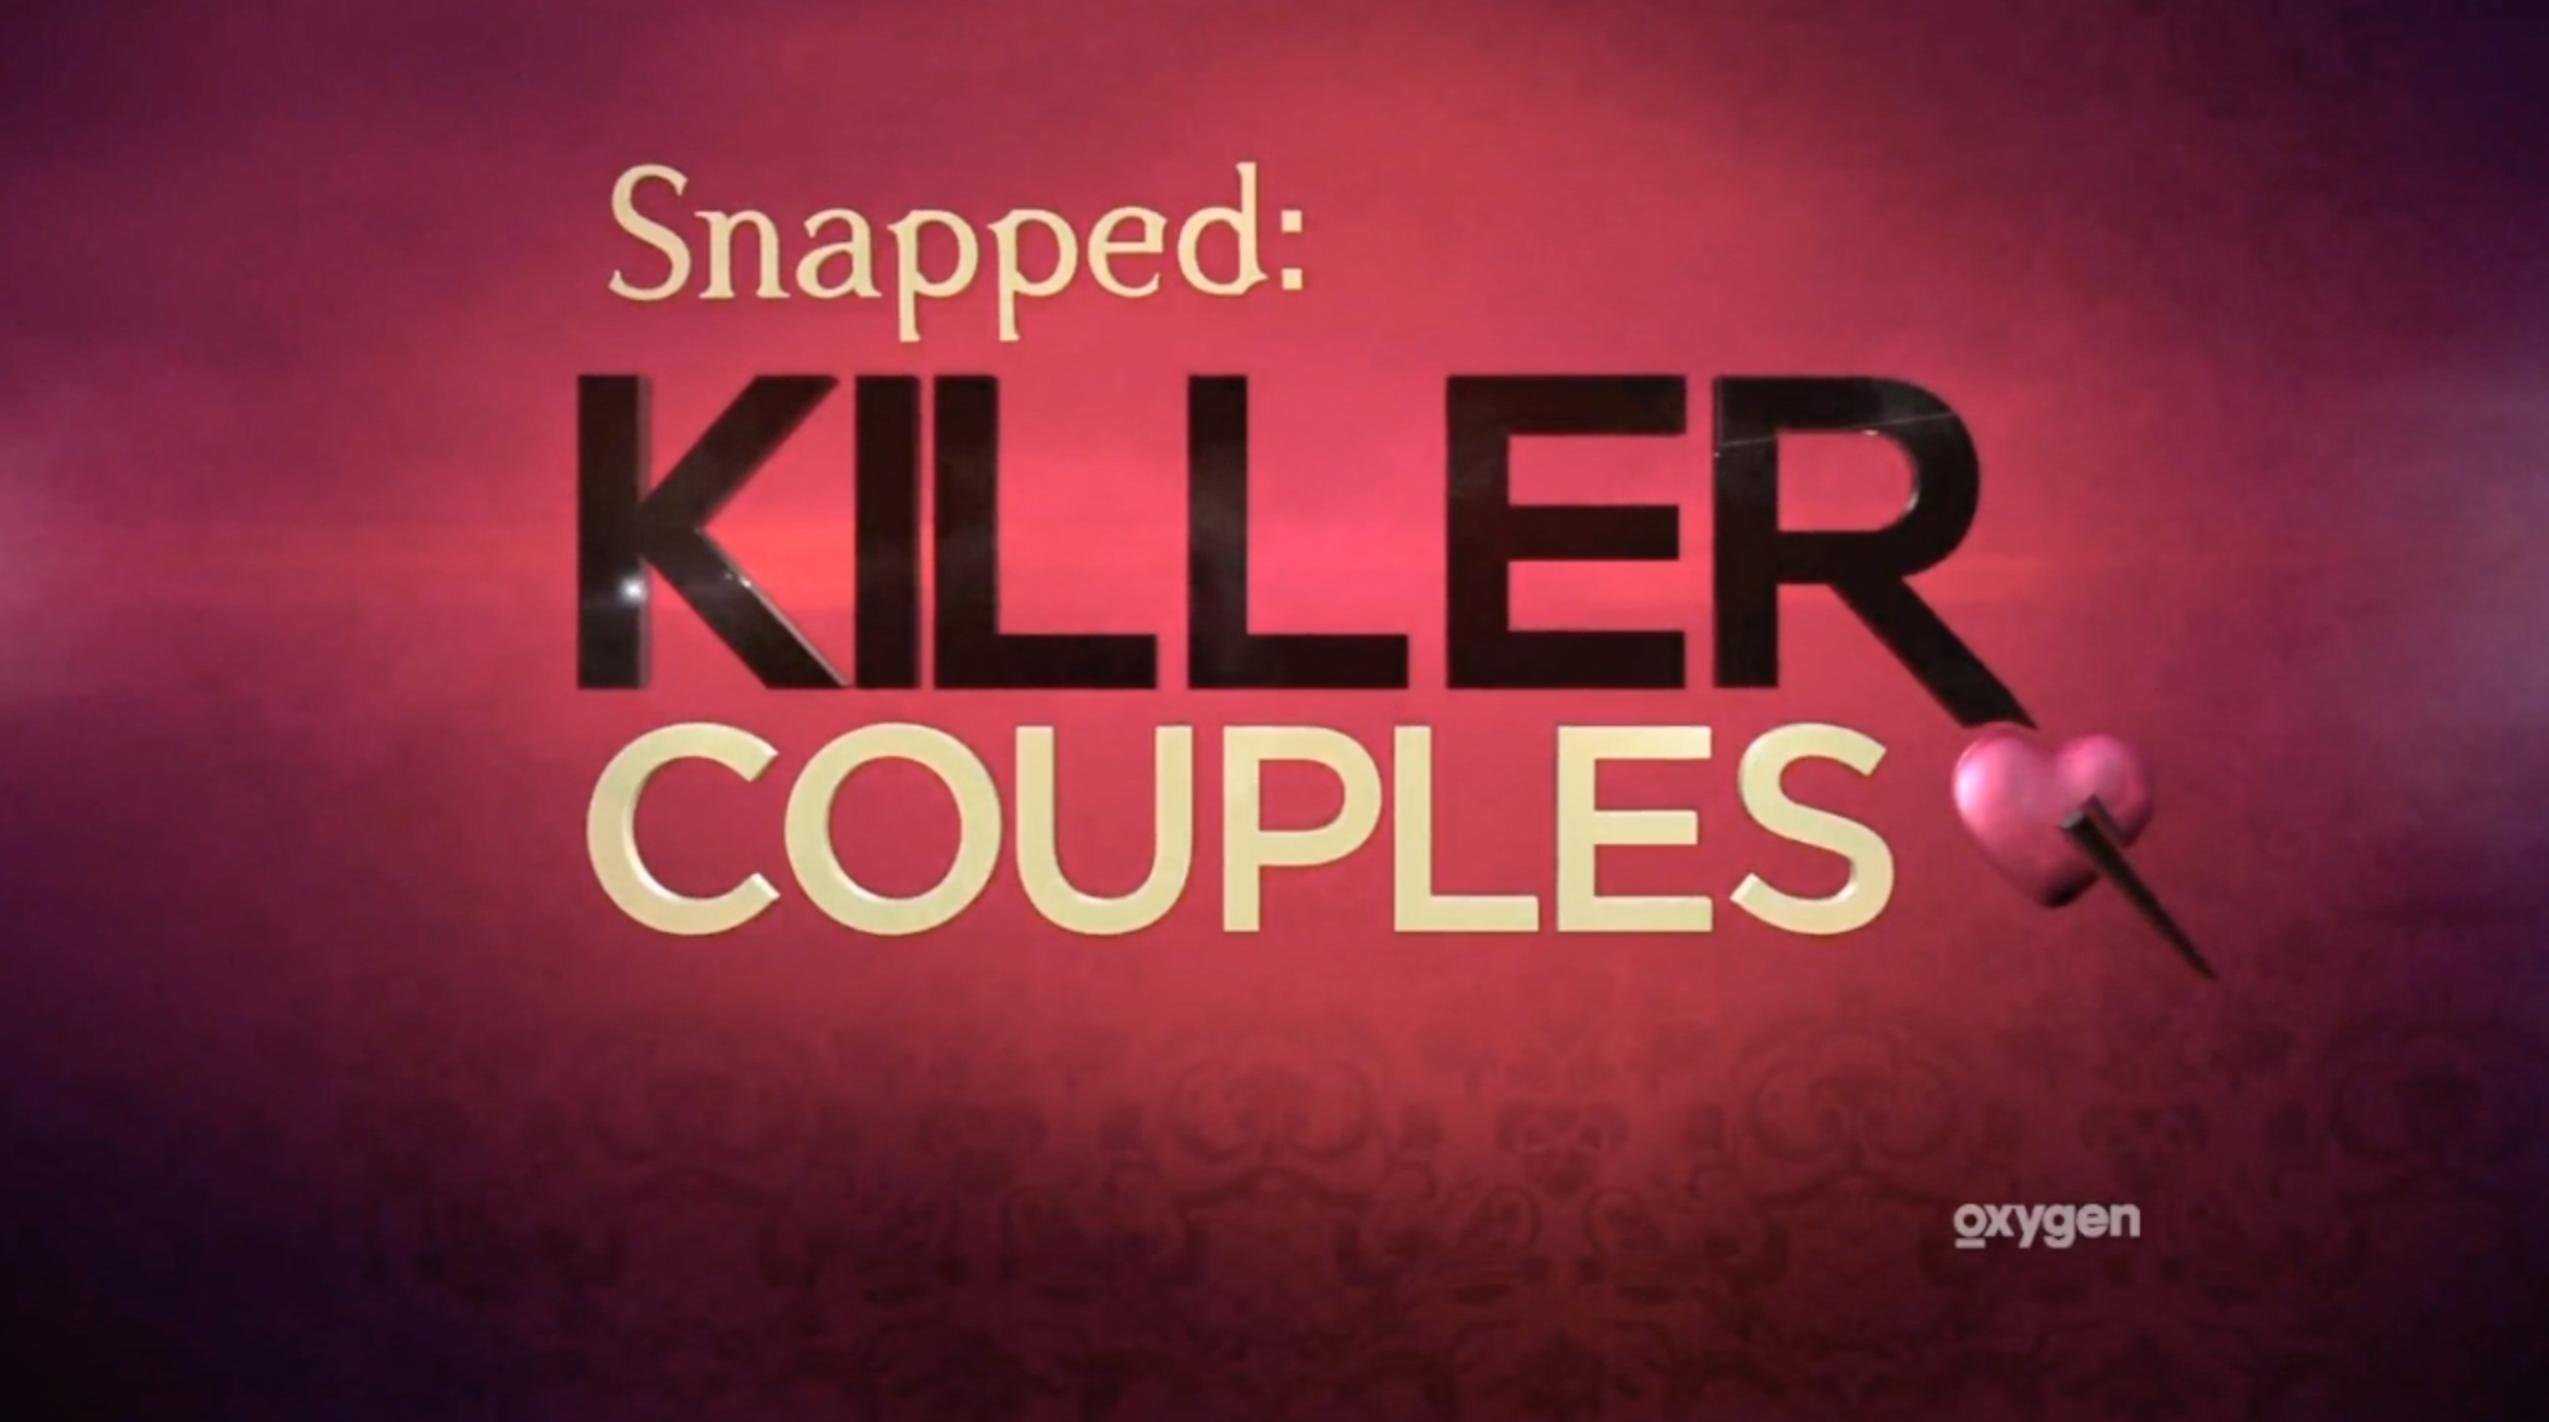 oxygen snapped - killer couples